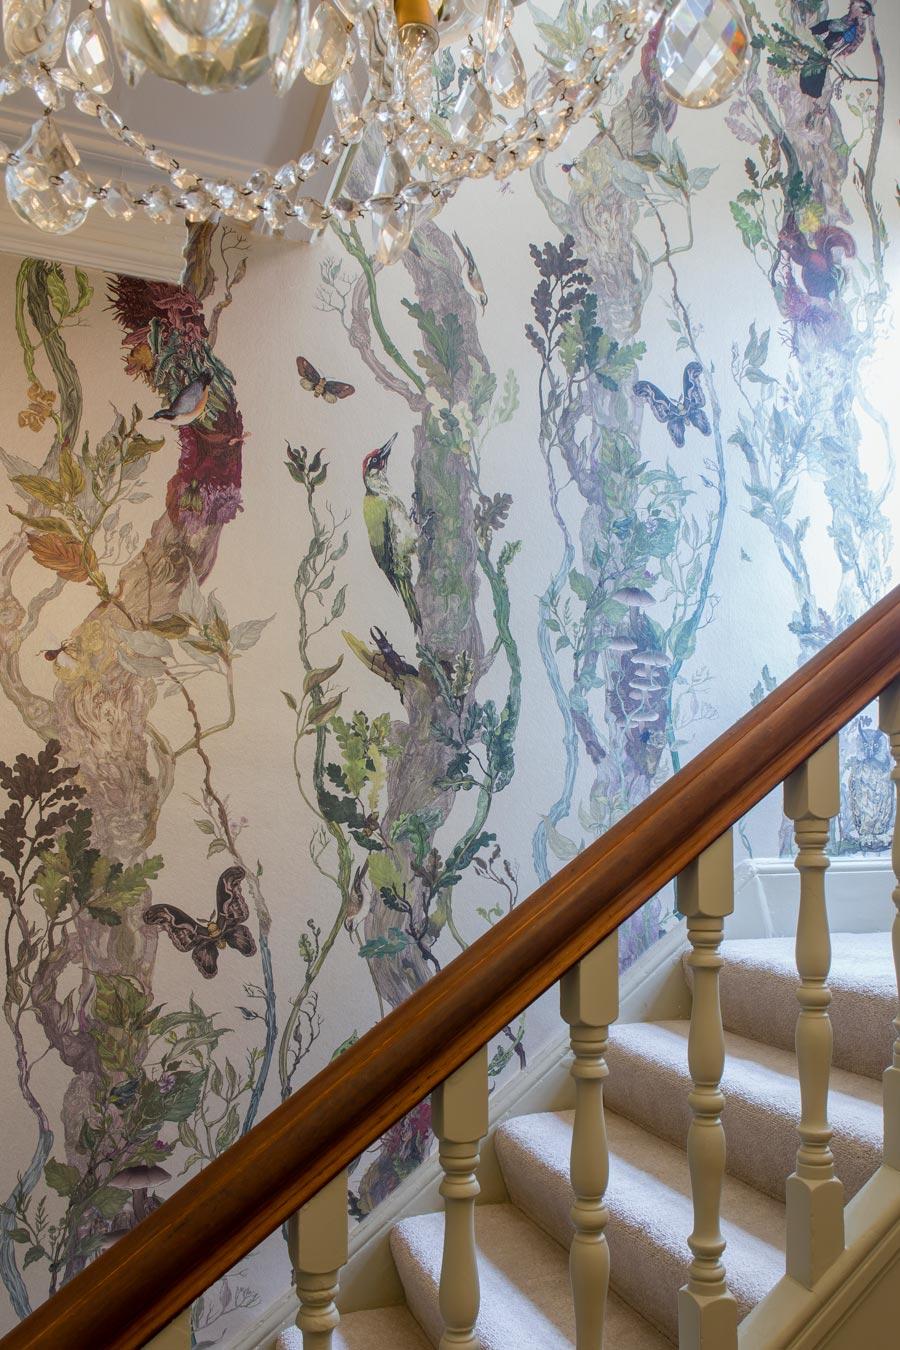 rogue designs interior architecture (23).jpg